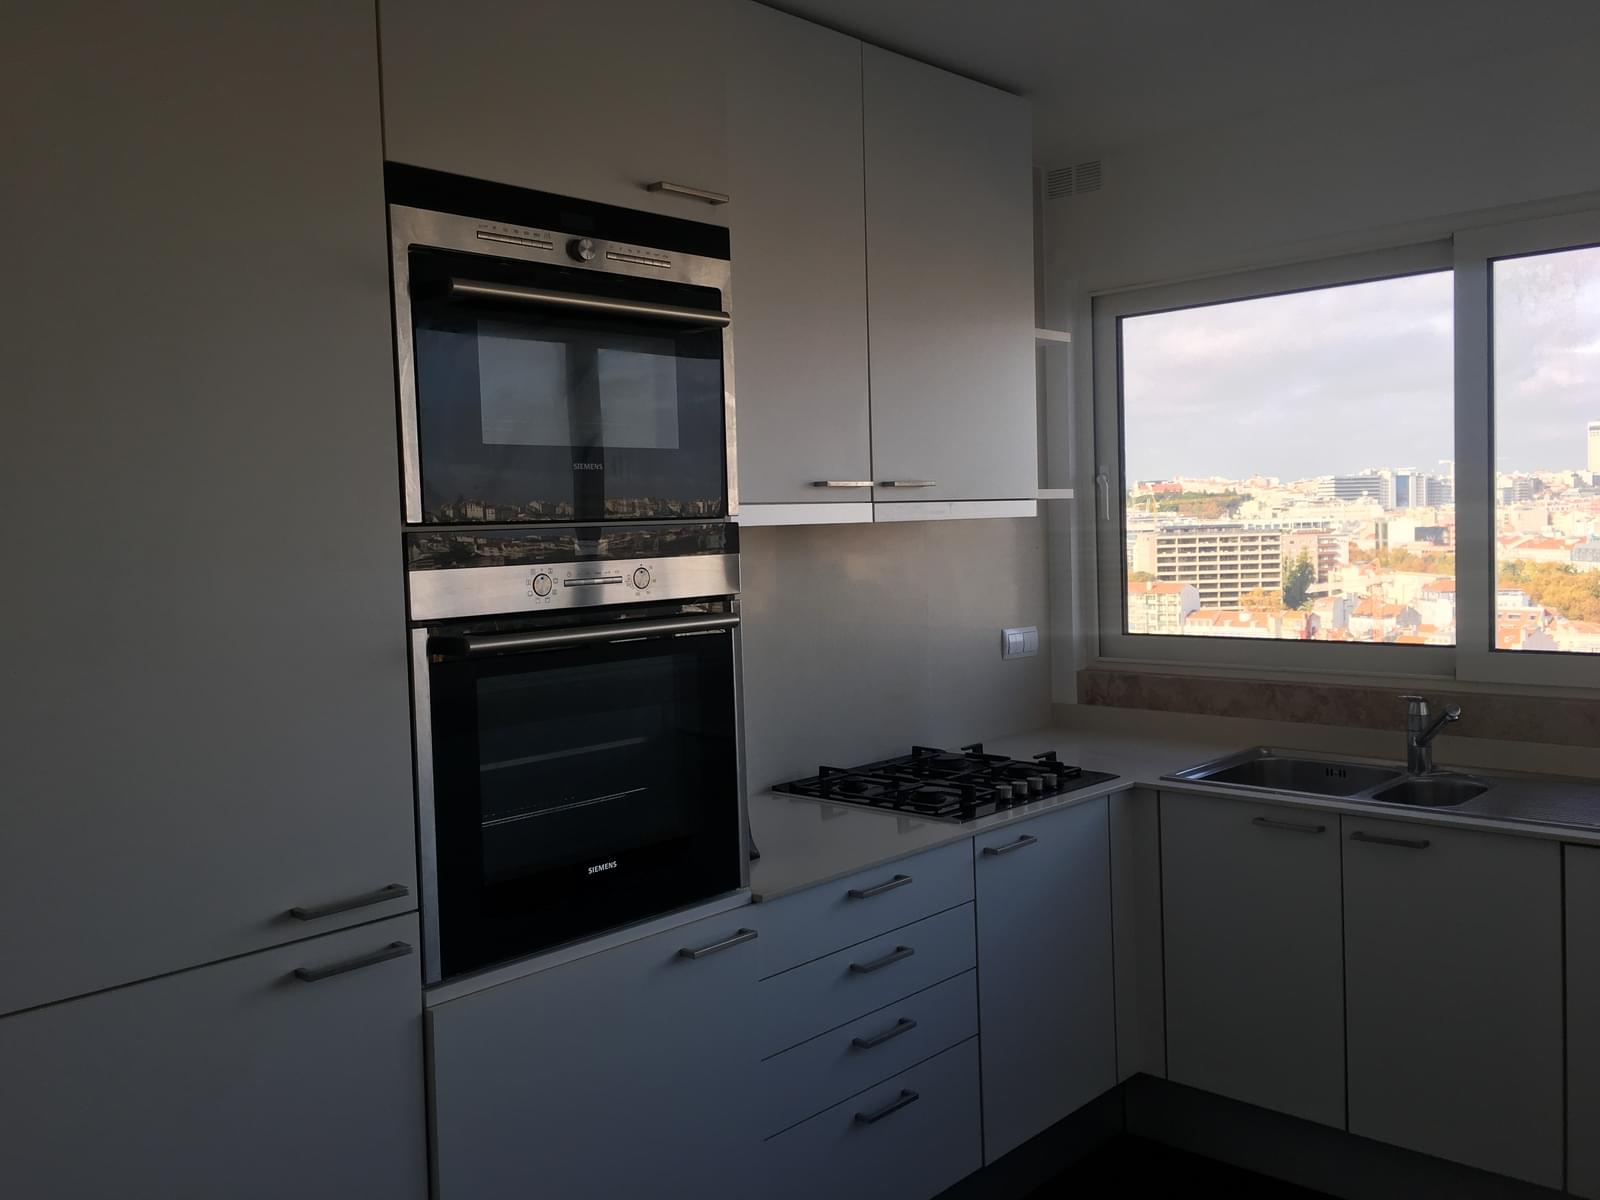 pf18822-apartamento-t1-lisboa-bf5ce1f2-6c03-4179-882c-2ceb05157453